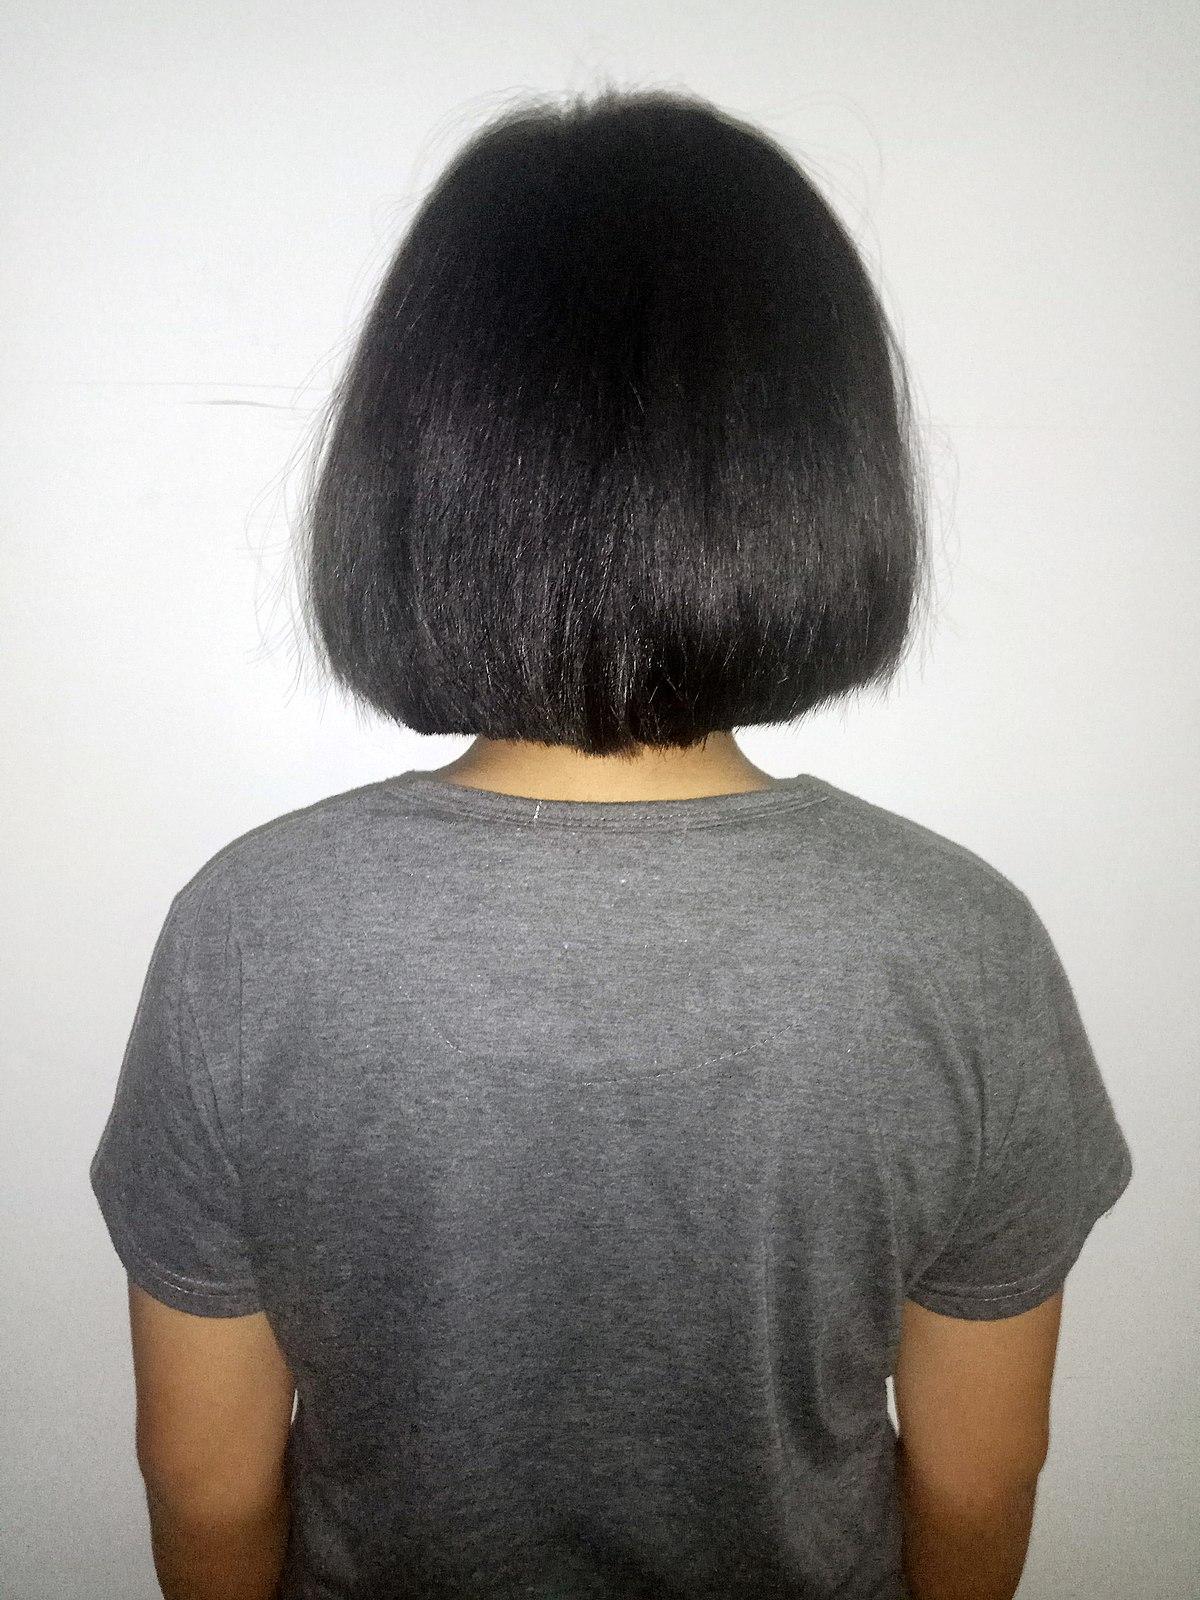 Short hair - Wikipedia